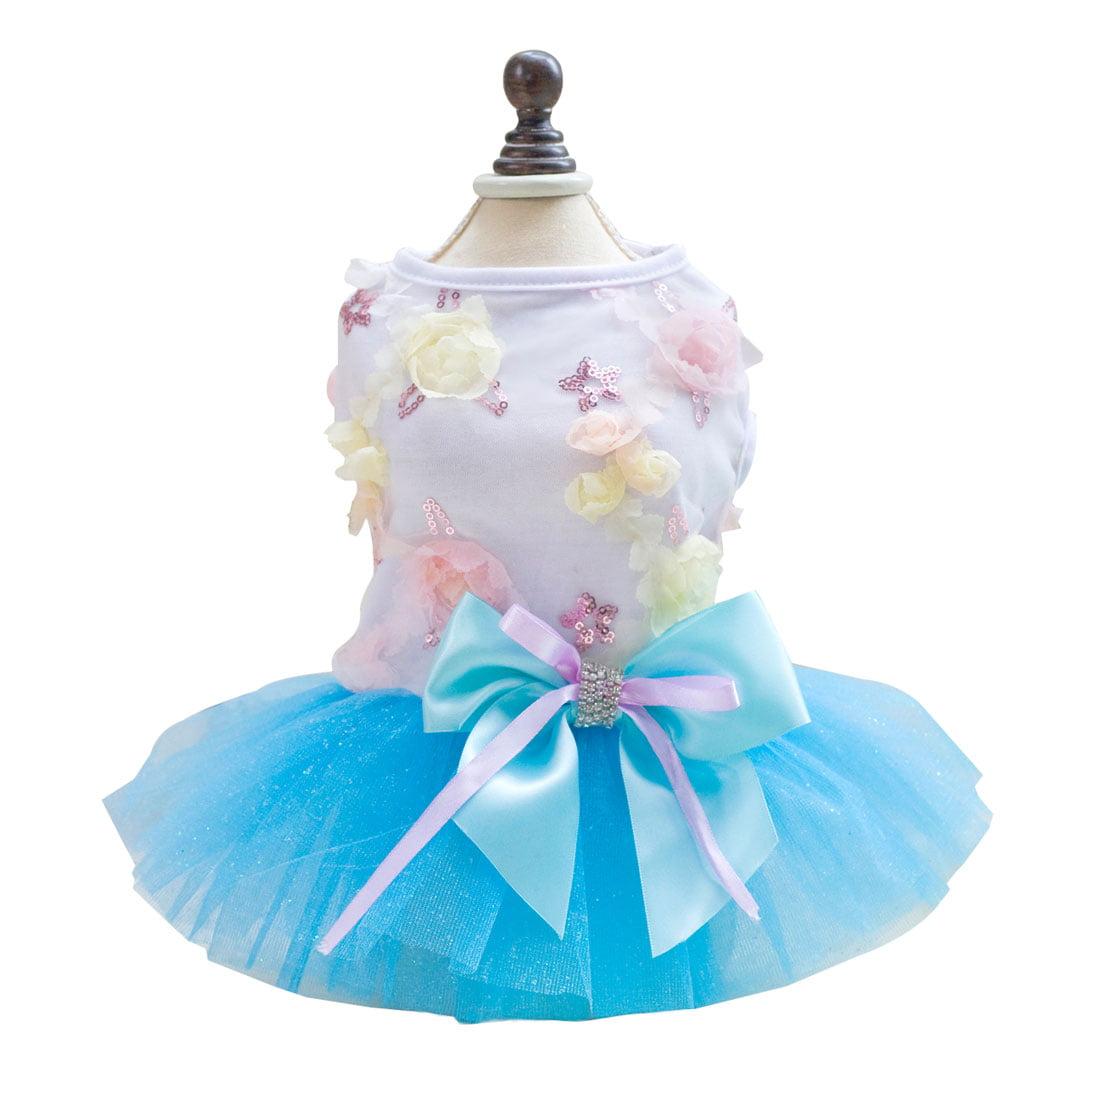 Pet Small Dog Dress Puppy Lace Princess Tutu Skirt Summer Costume Blue M